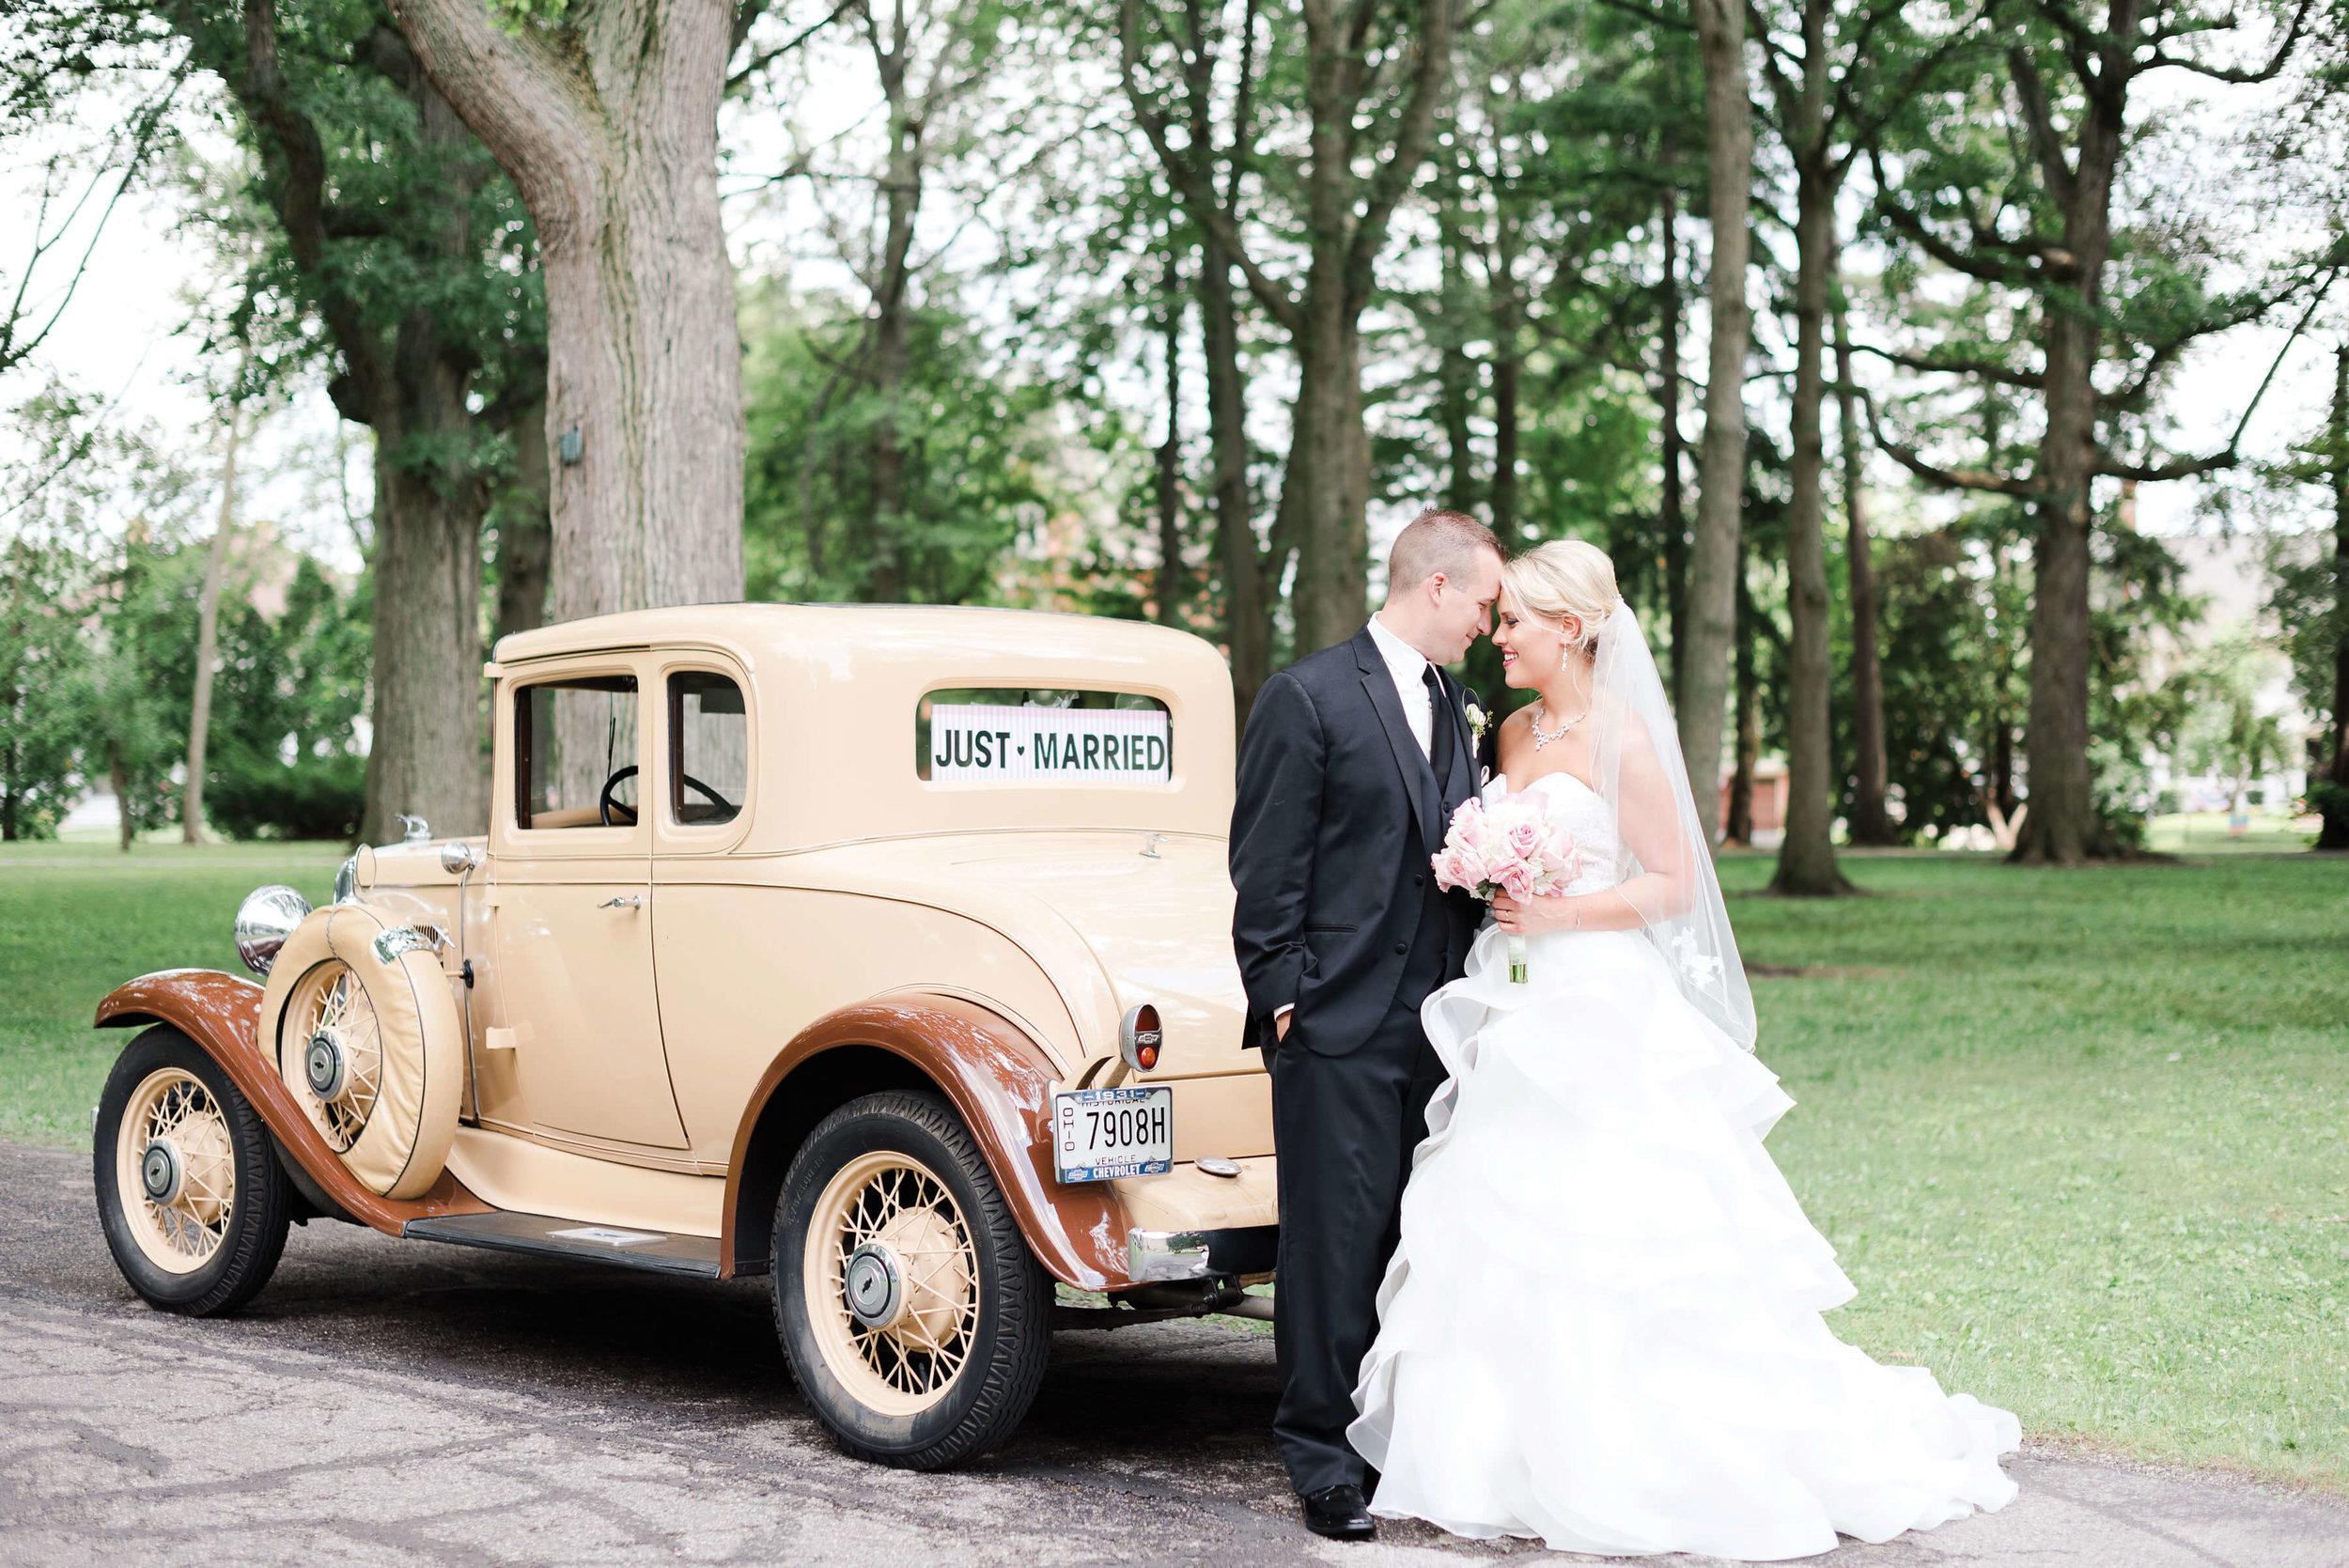 Wedding-More-Personal.jpg